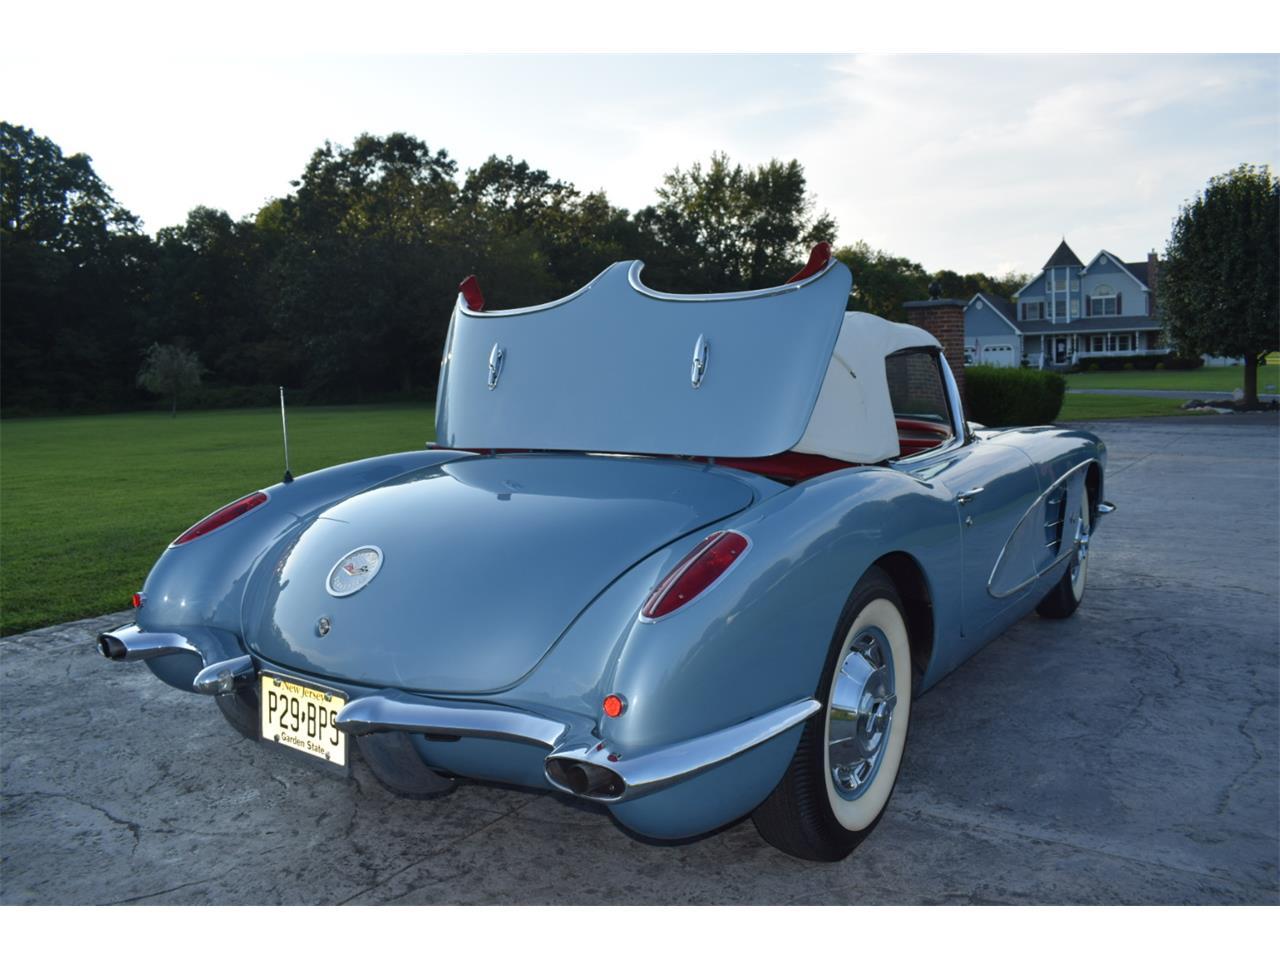 1959 Chevrolet Corvette (CC-1364258) for sale in Williamstown, New Jersey